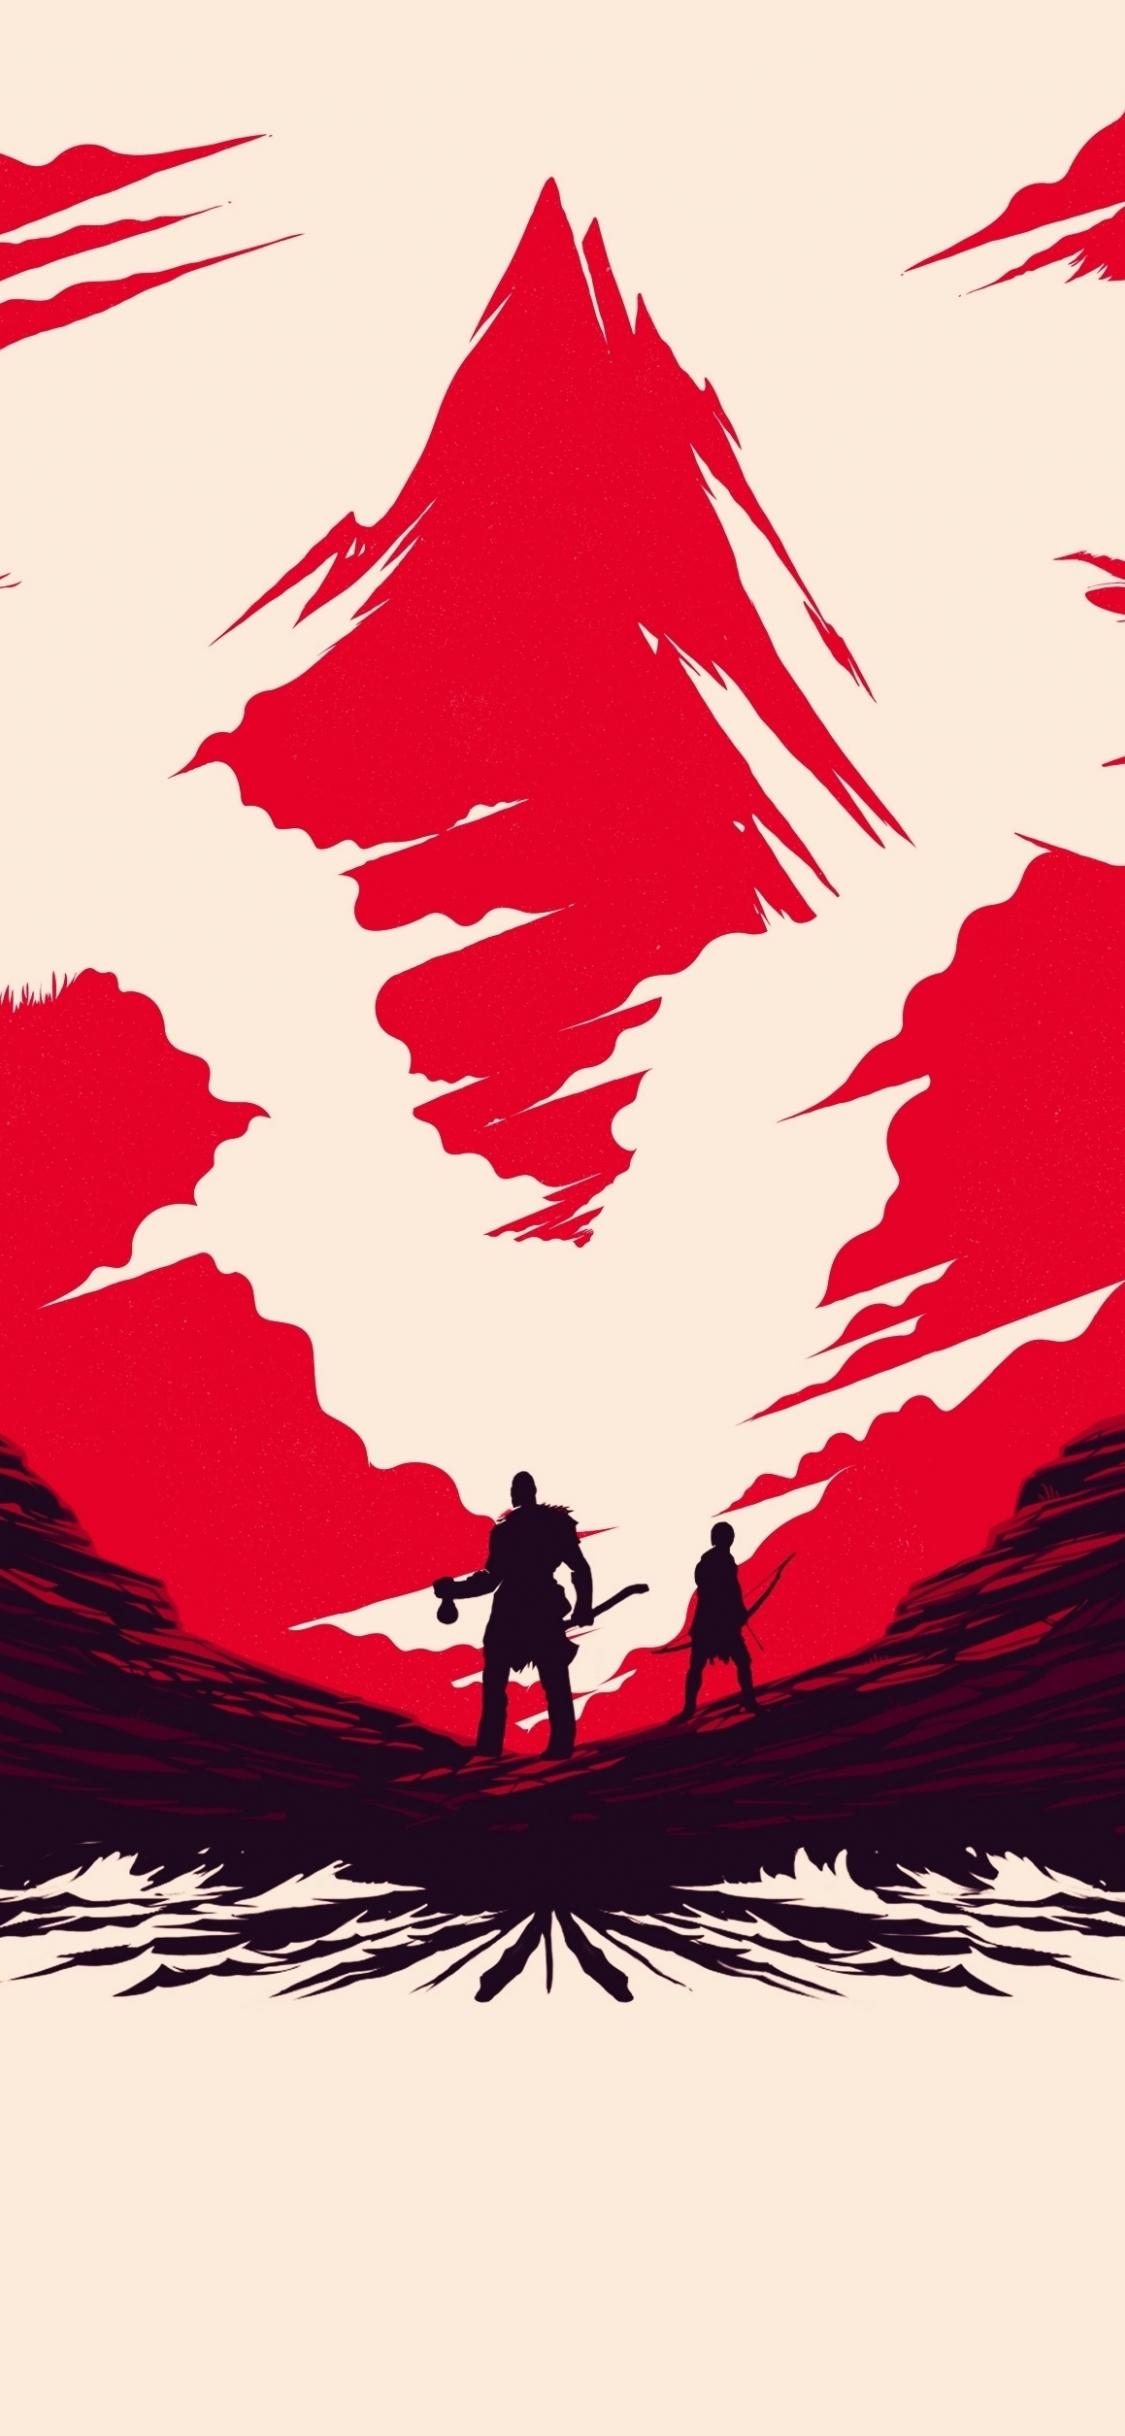 Download 1125x2436 Wallpaper Valley Video Game God Of War Art